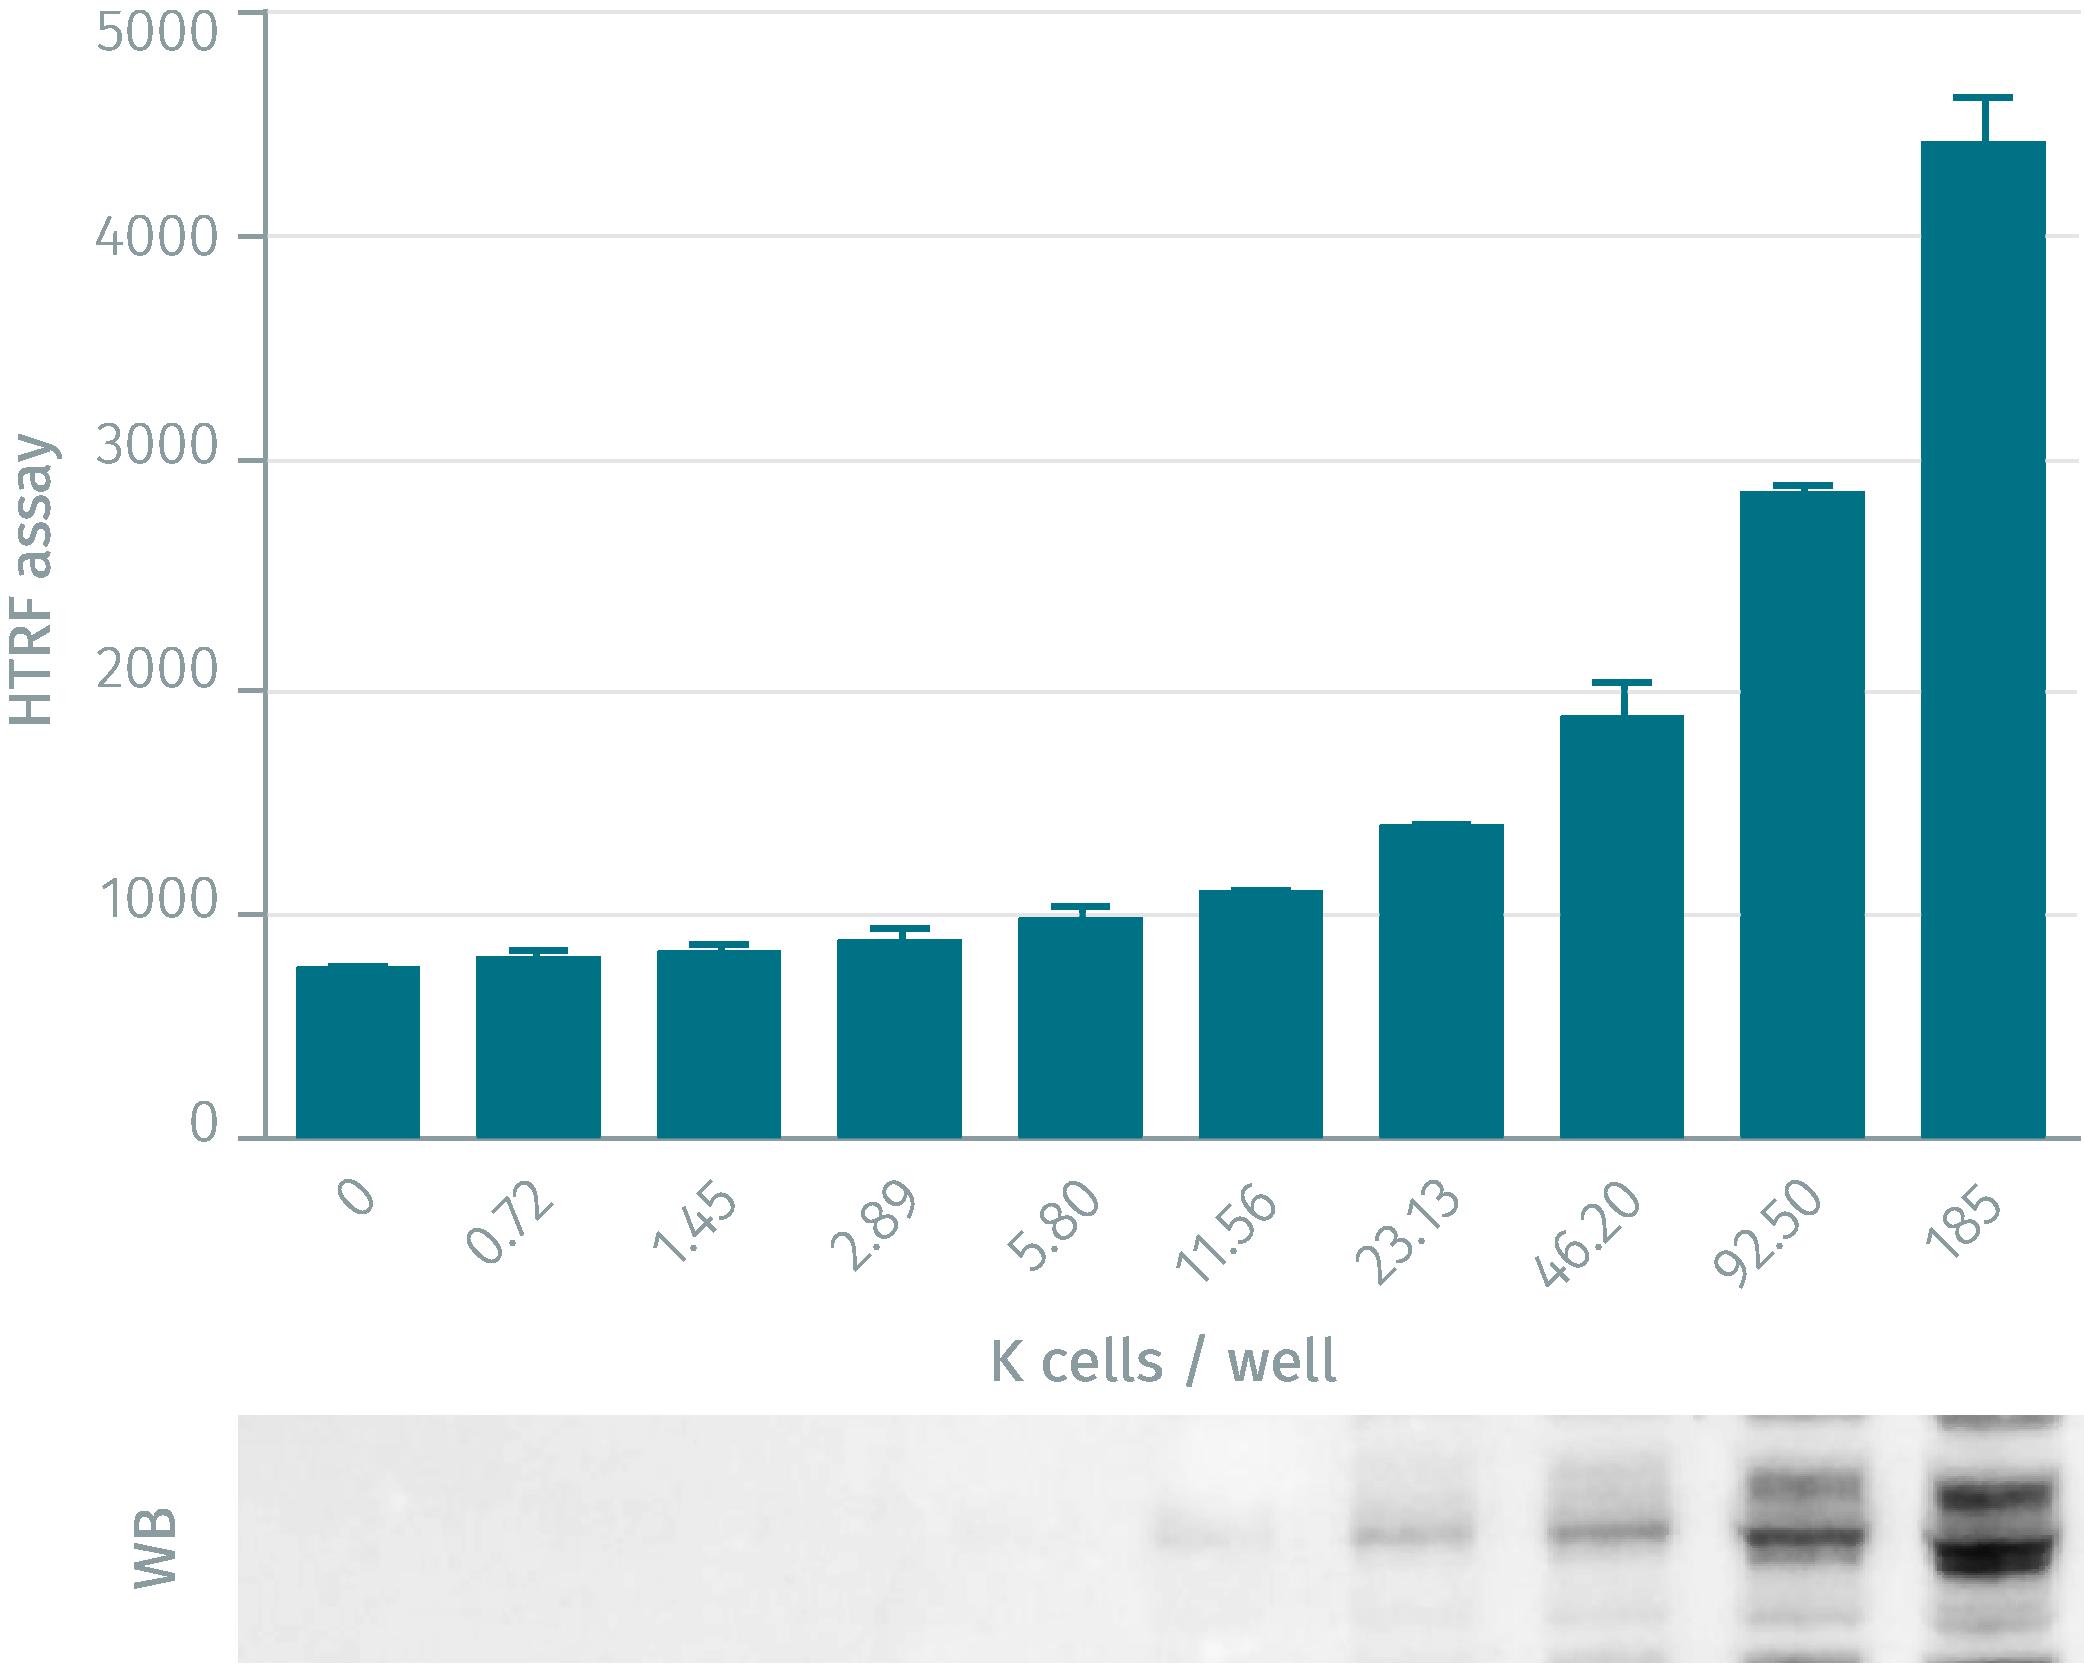 HTRF phospho-IKKß assay compared to Western Blot